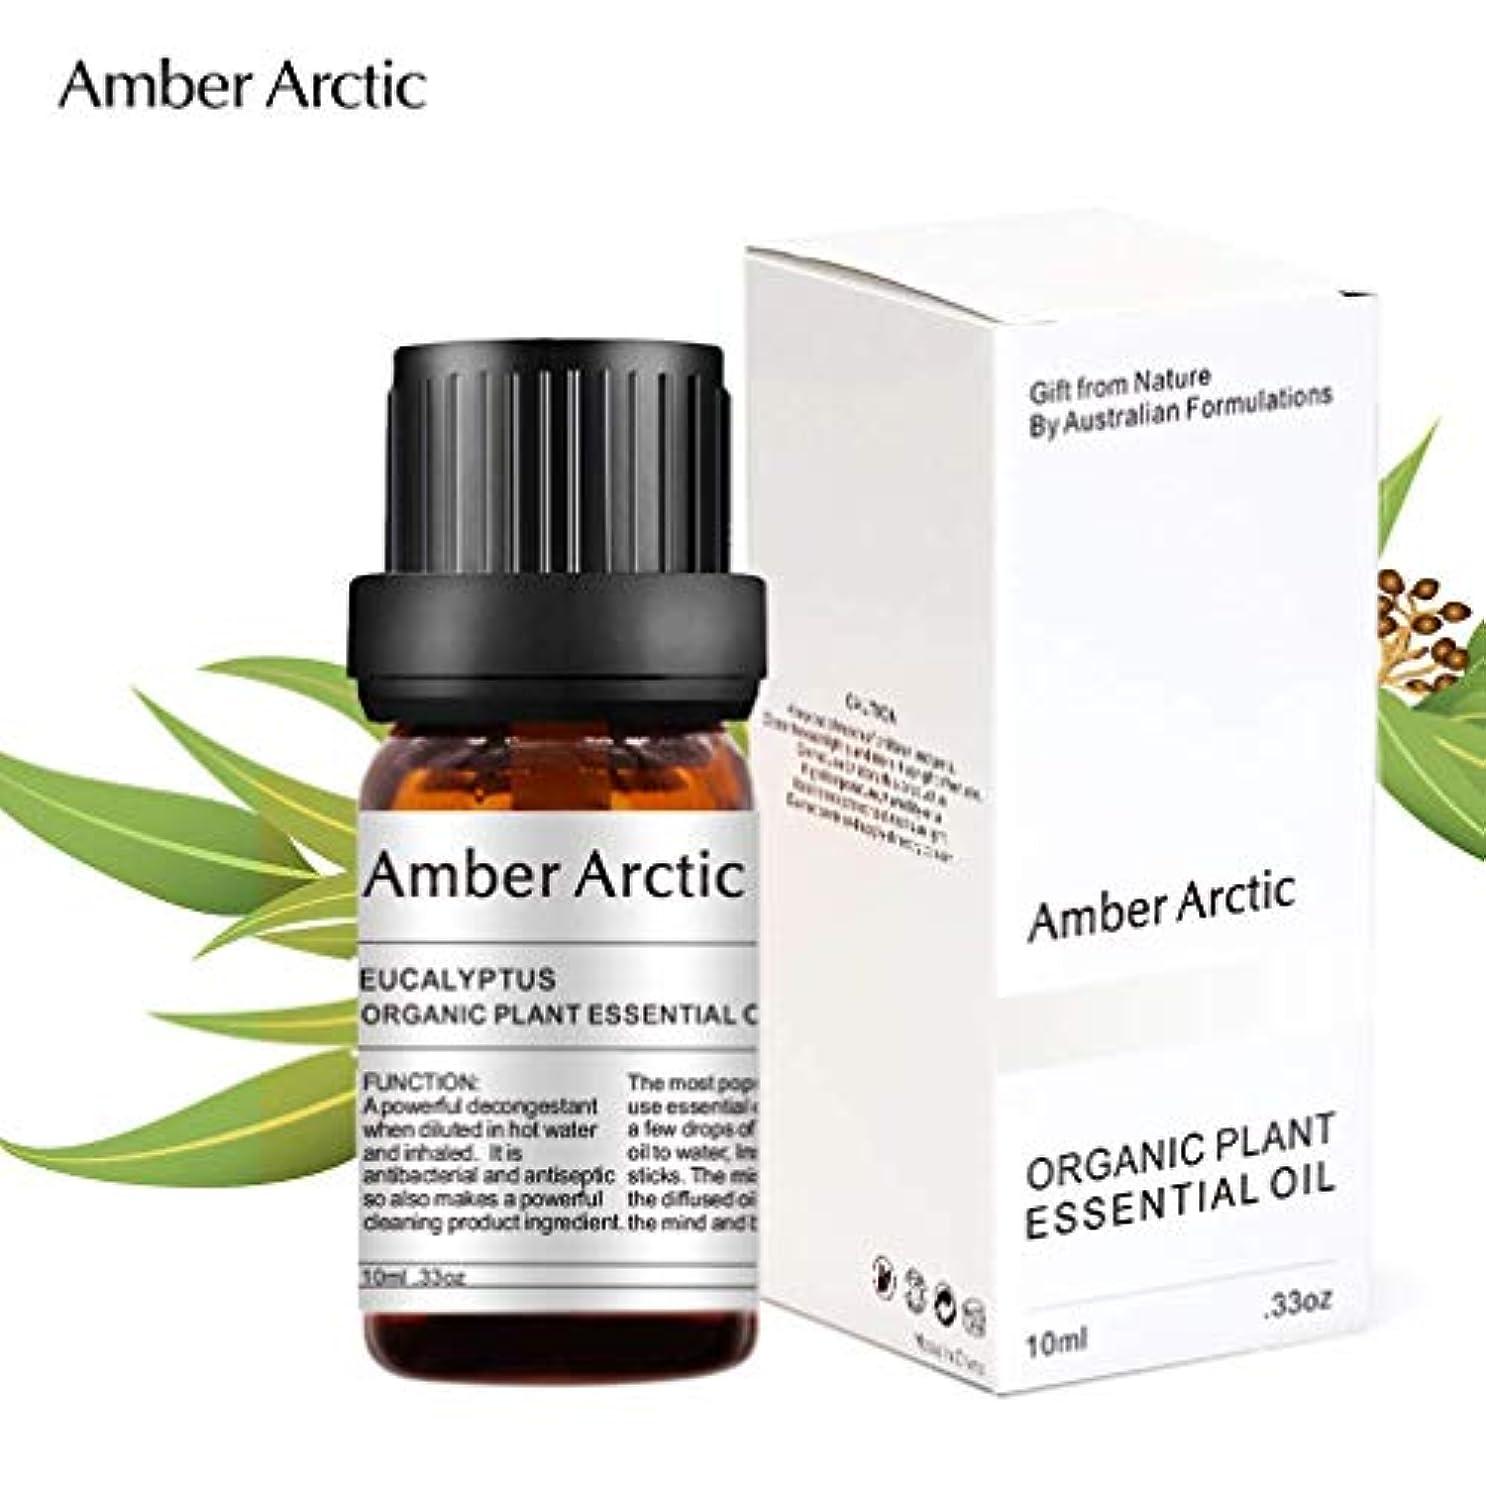 Amber Arctic ユーカリ エッセンシャル オイル、 ディフューザー 用 100% 純粋 天然 アロマ ユーカリ オイル (10ミリリットル)